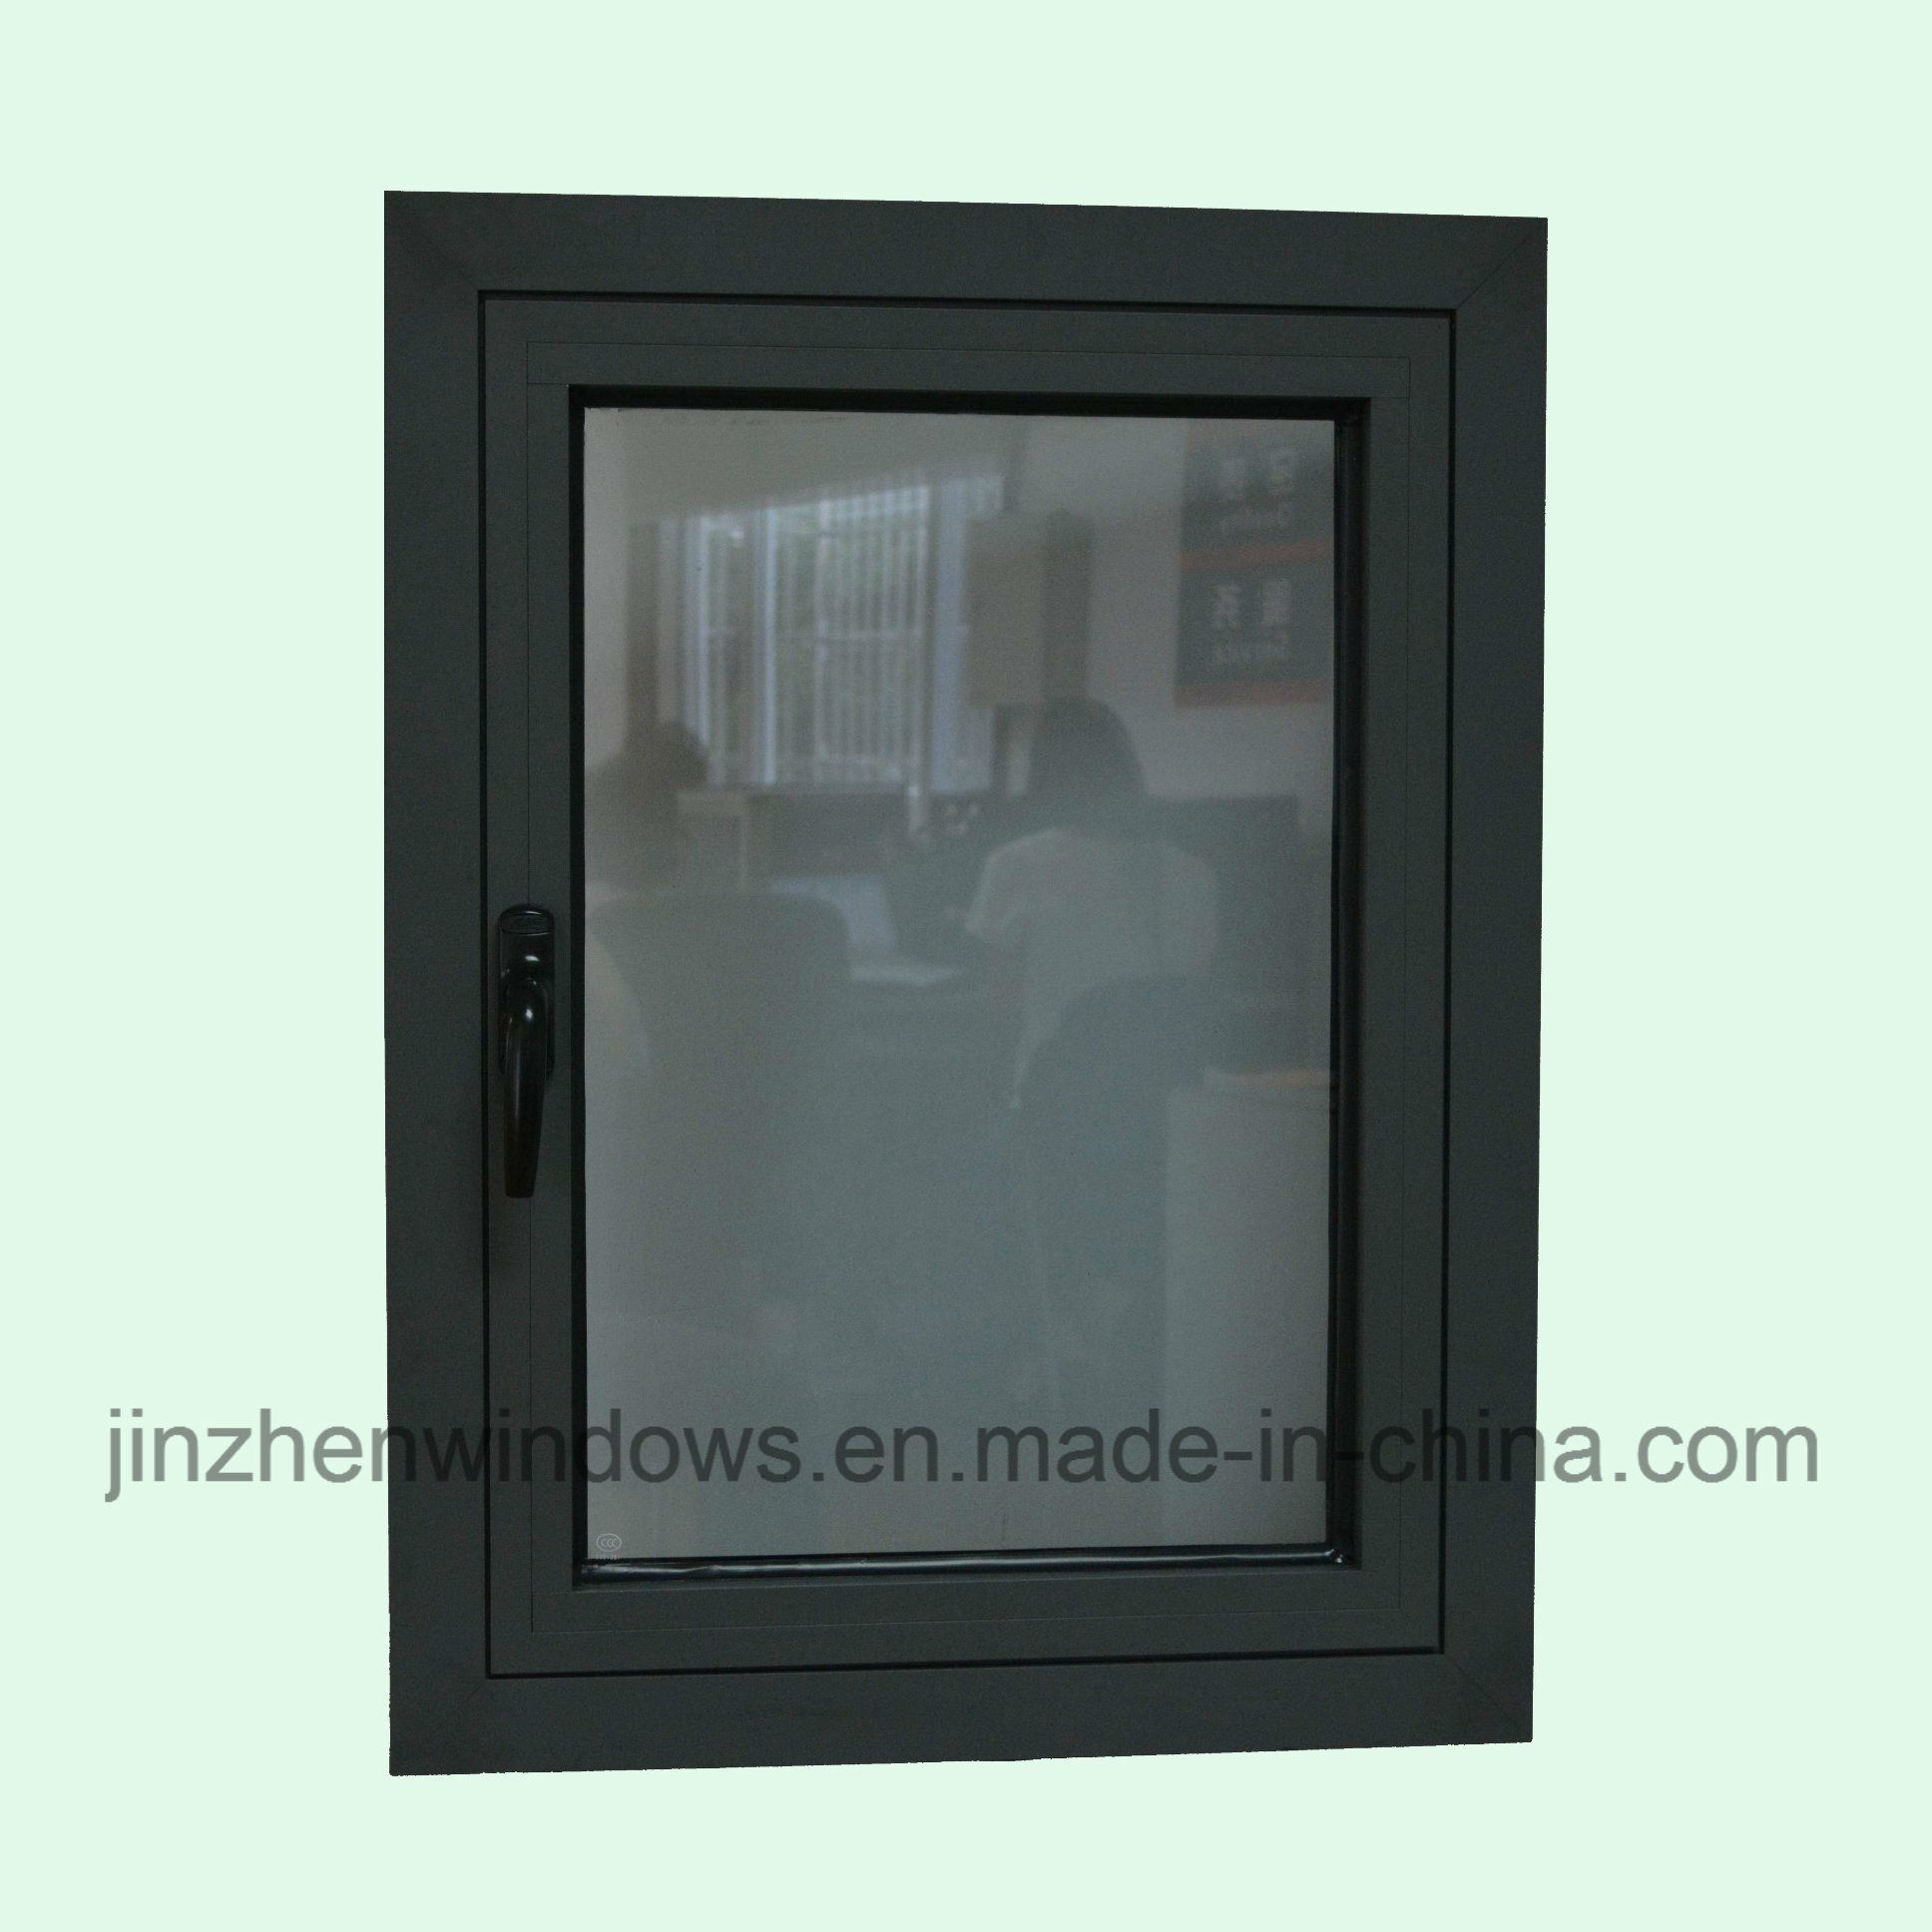 High Quality Thermal Break Aluminum Profile Casement Window with Multi Lock K03064